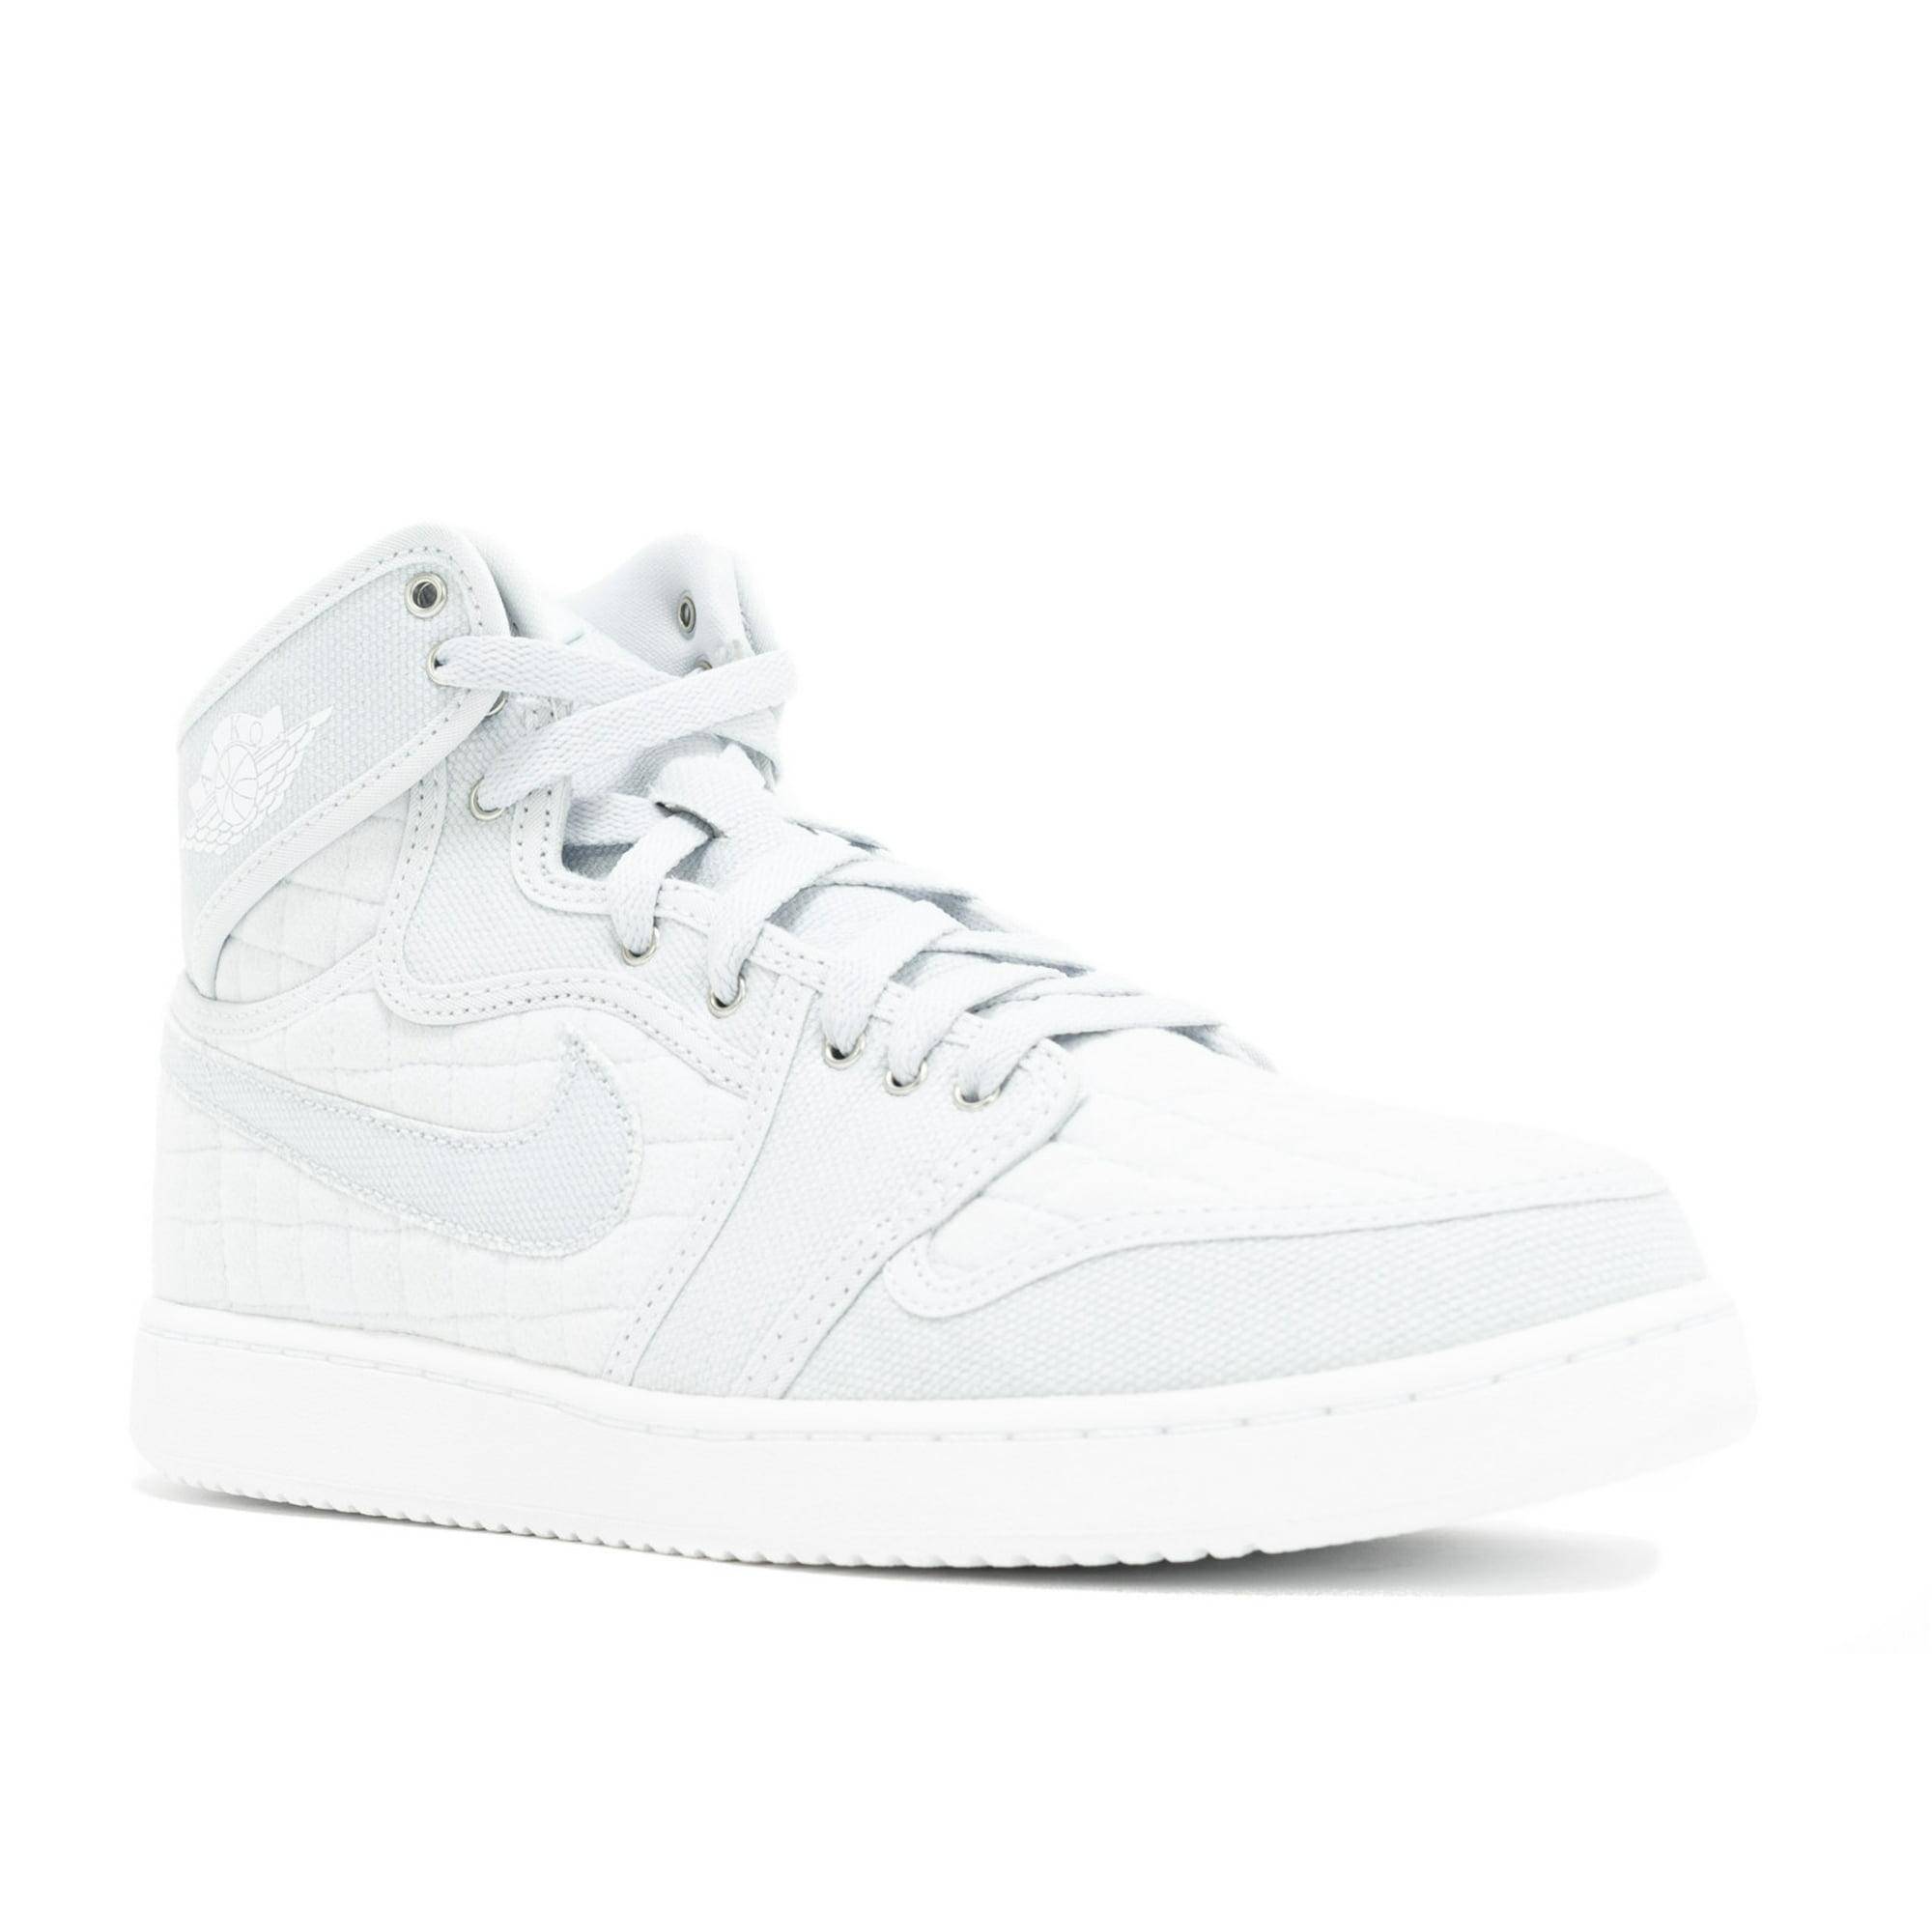 best loved a50dc 05588 Air Jordan - Men - Aj1 Ko High Og  Pure Platinum  - 638471-004 - Size 12.5    Walmart Canada